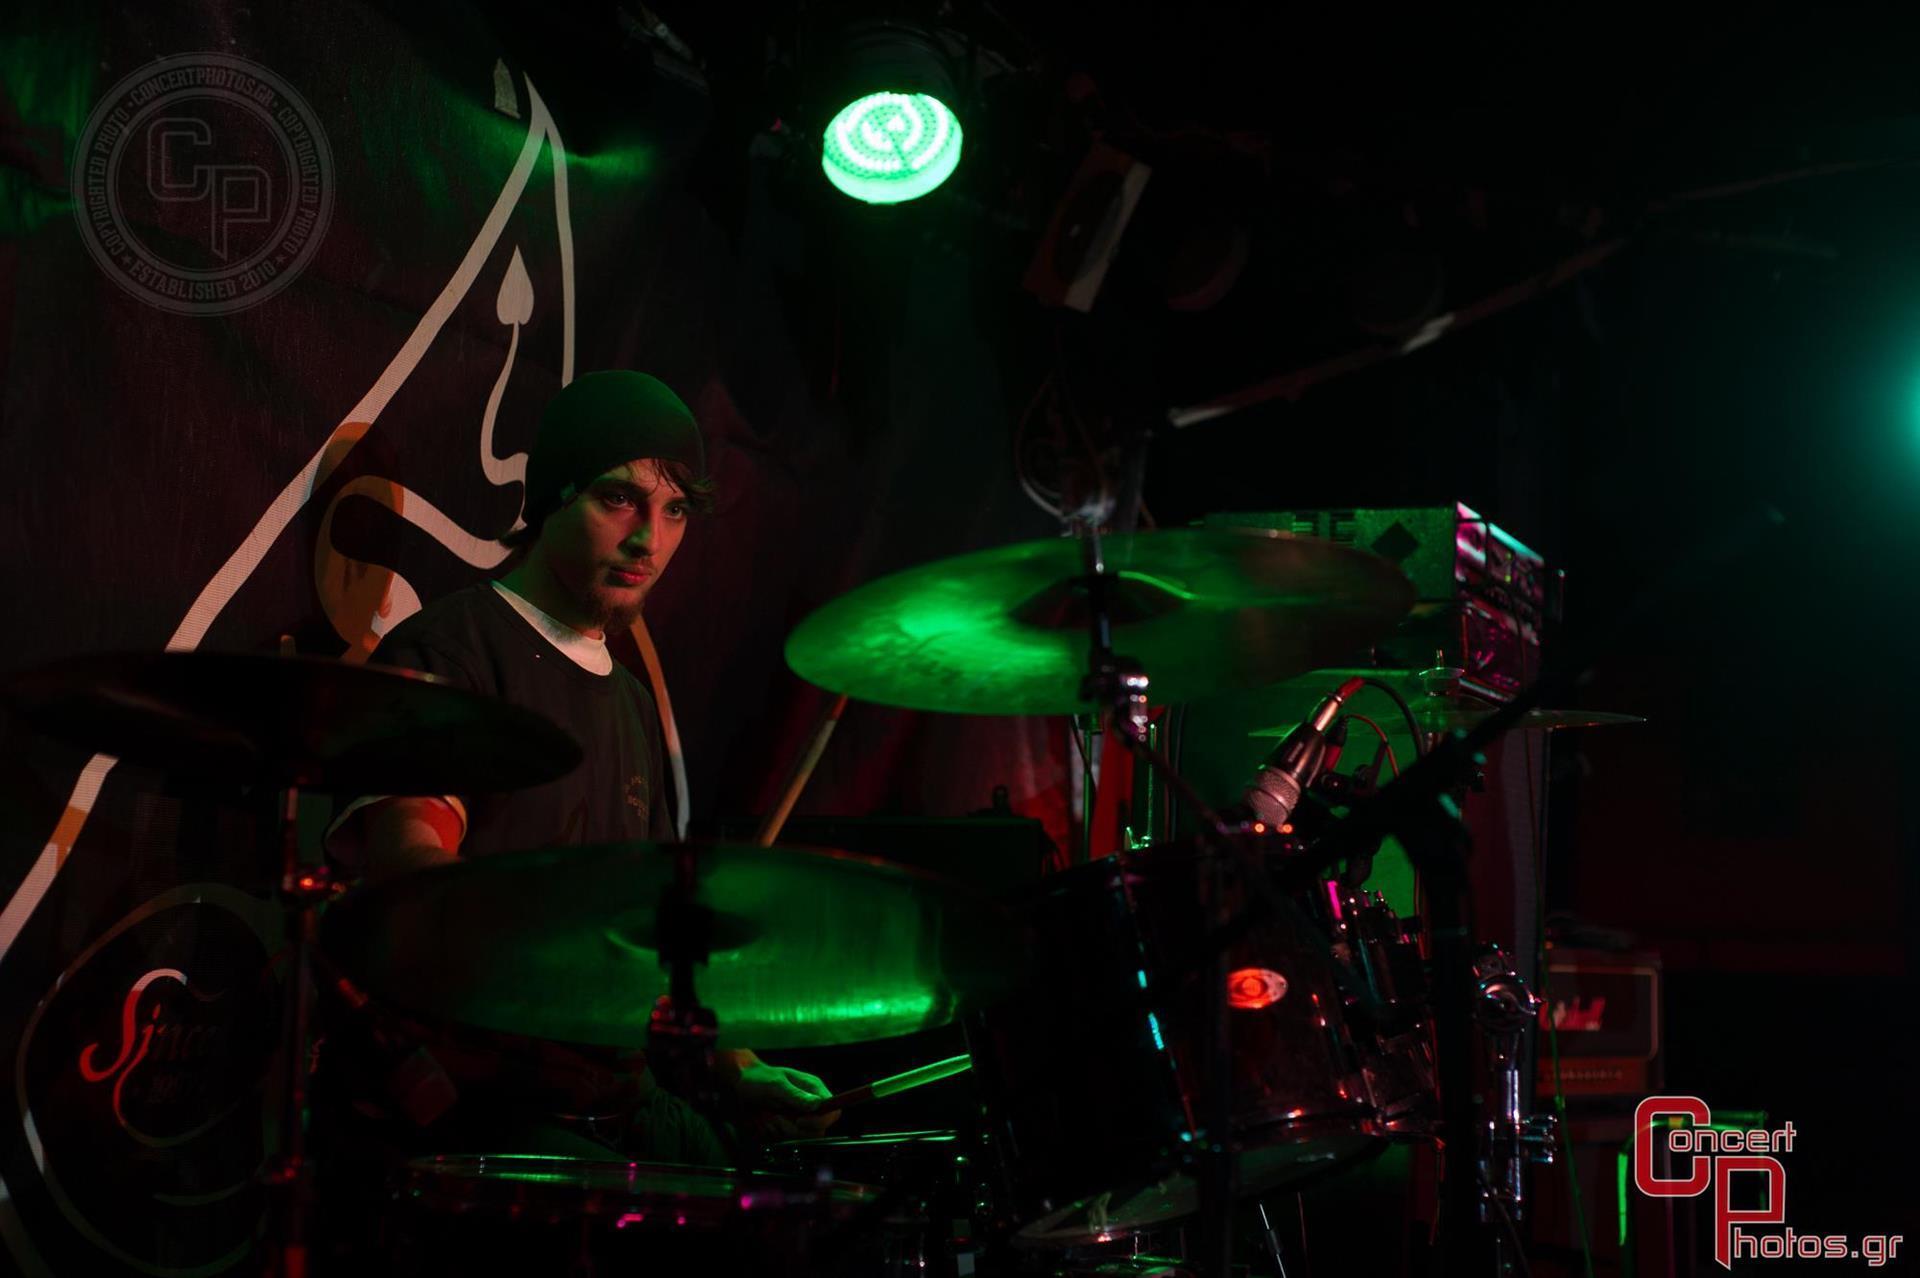 Battle Of The Bands Athens - Leg 3- photographer:  - ConcertPhotos - 20150104_2145_01